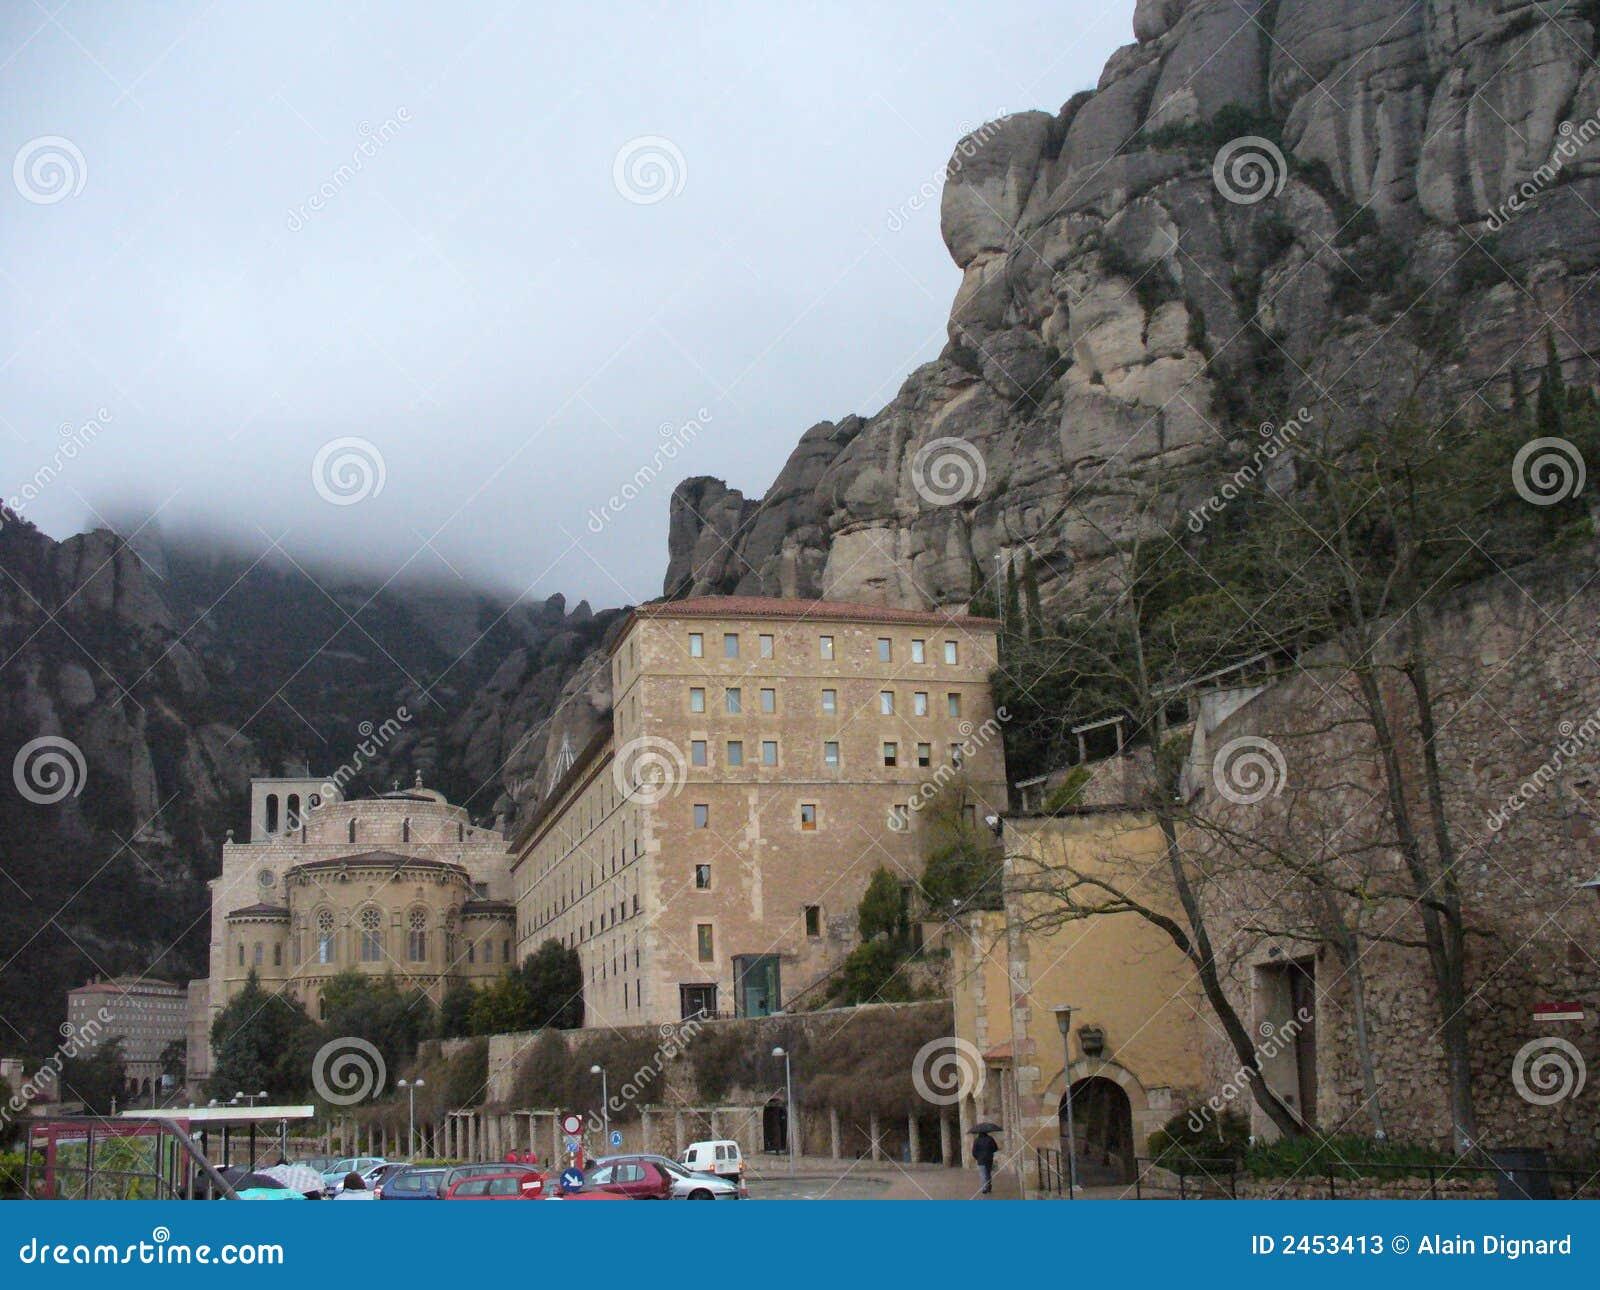 Monastery in Montserrat Spain